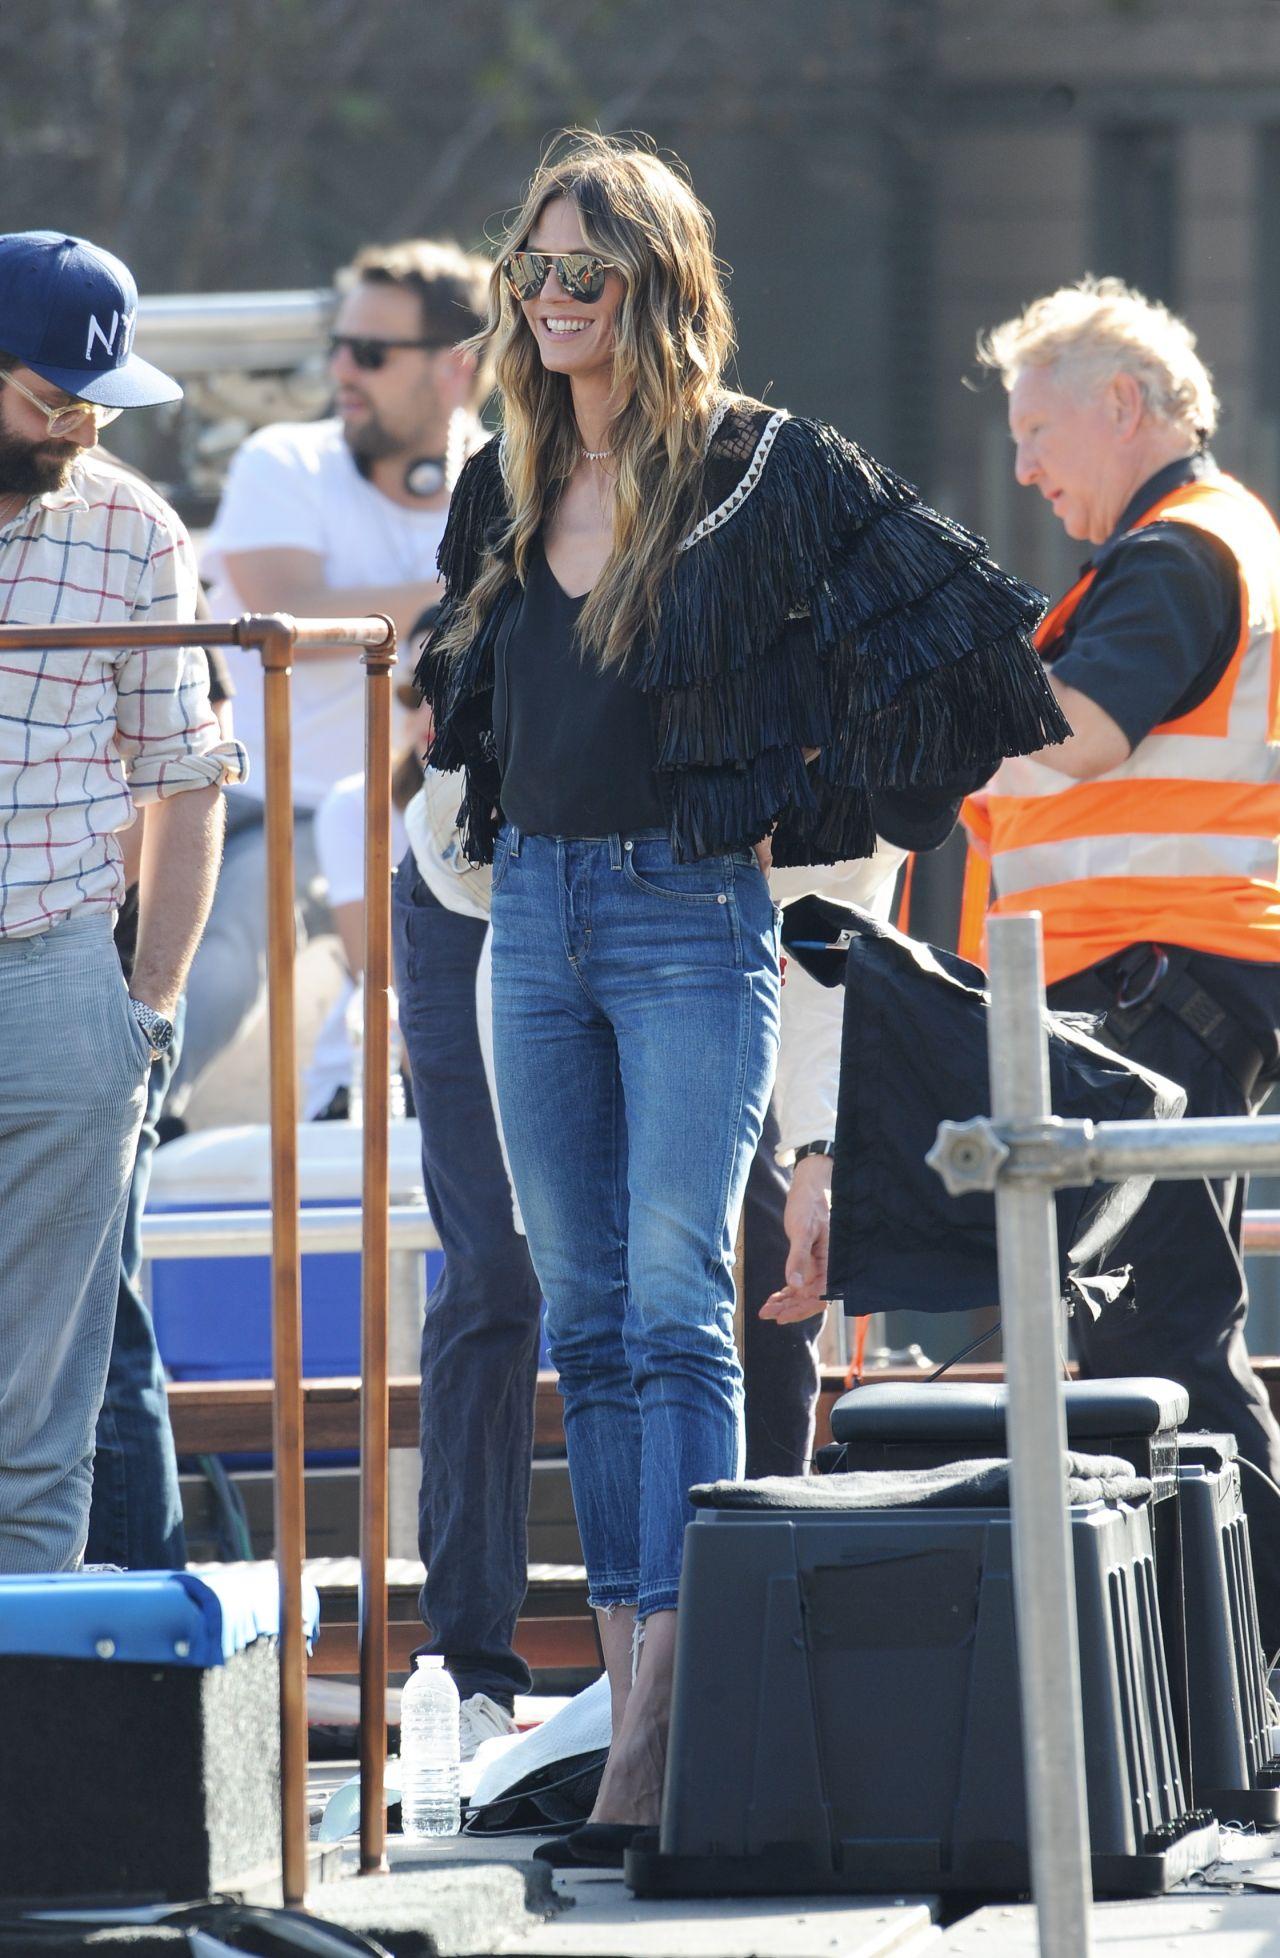 Heidi Klum Germanys Next Top Model Filming In Hollywood